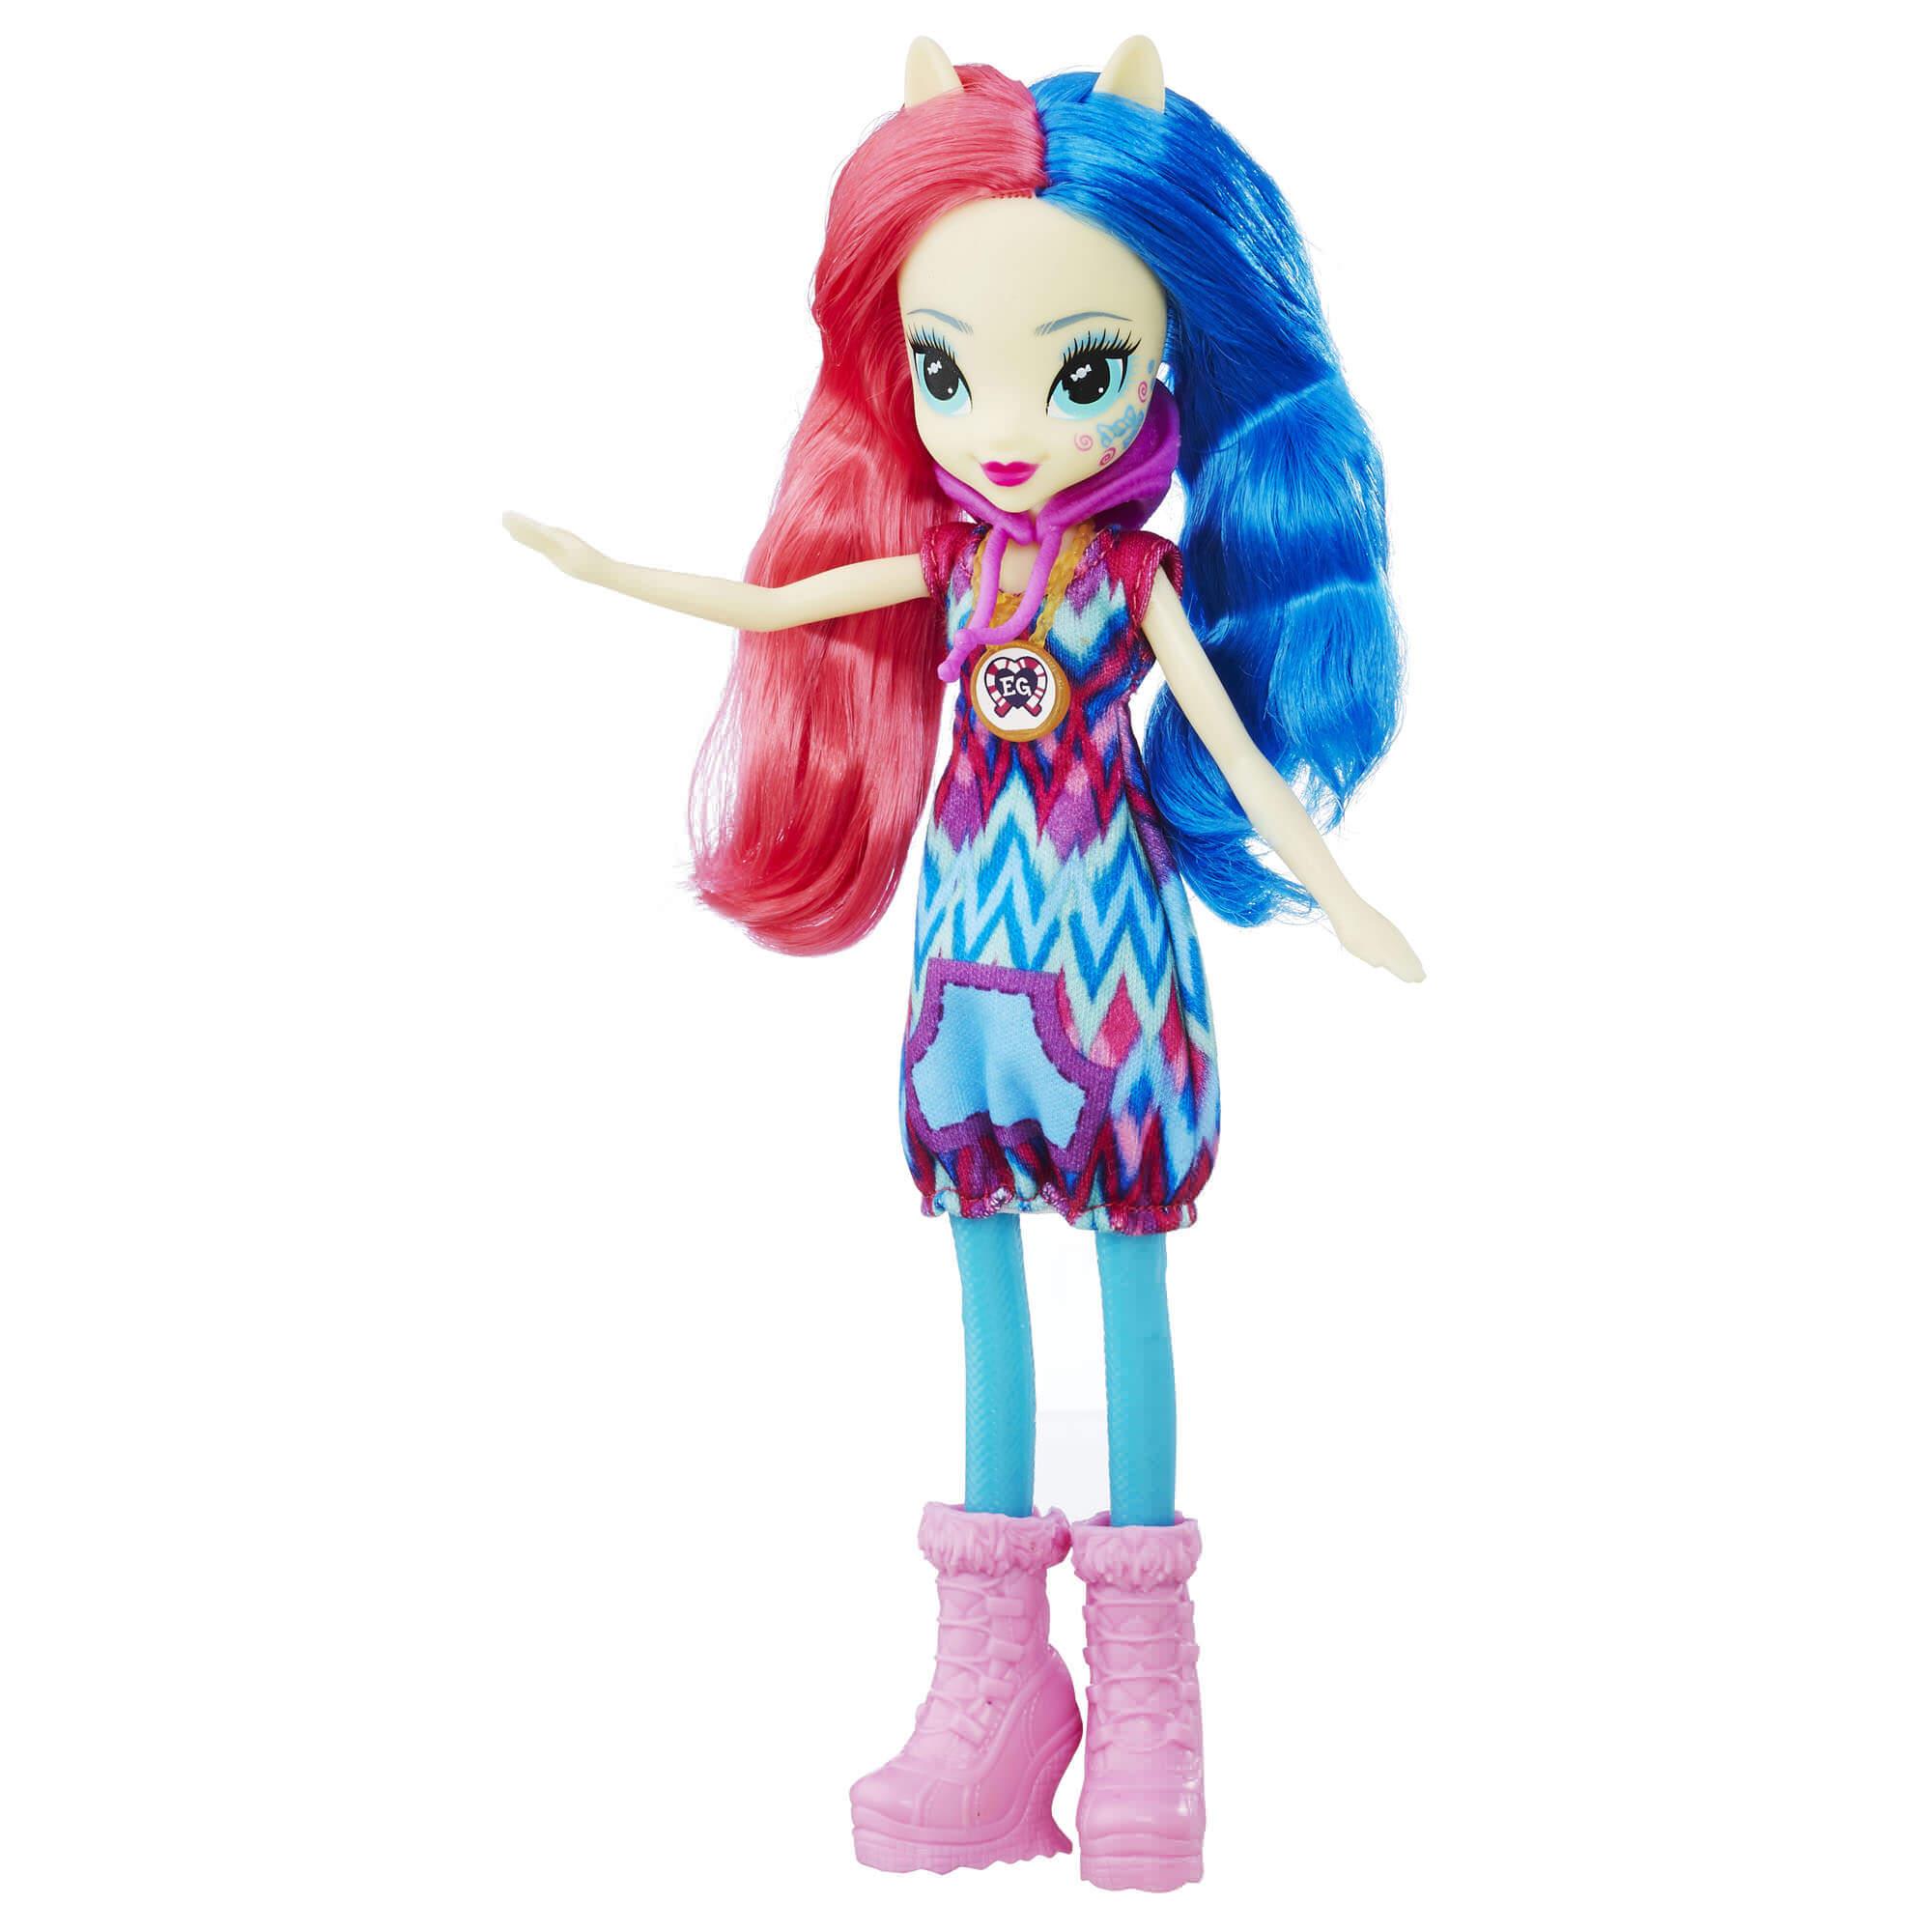 Boneca My Little Pony Equestria Girl B6477 Hasbro